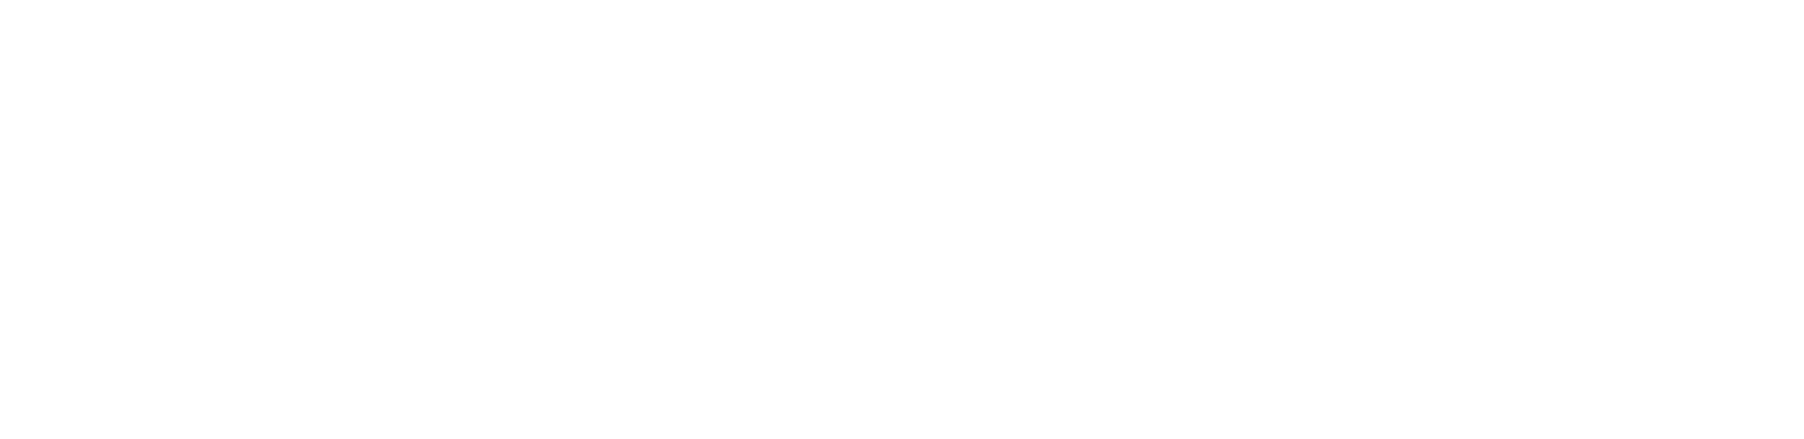 Southwire.